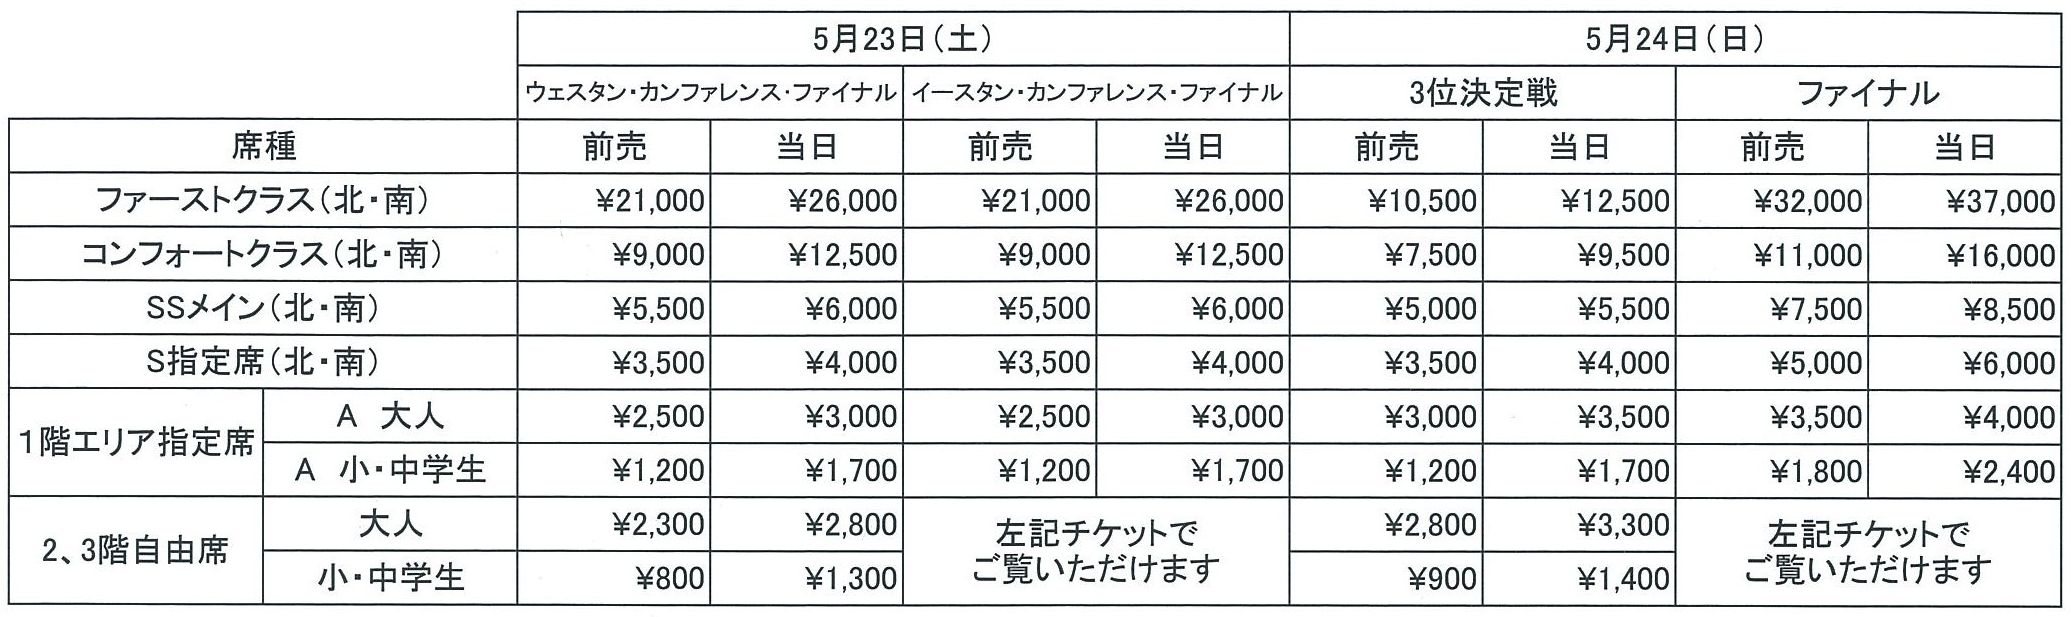 bjファイナル価格表